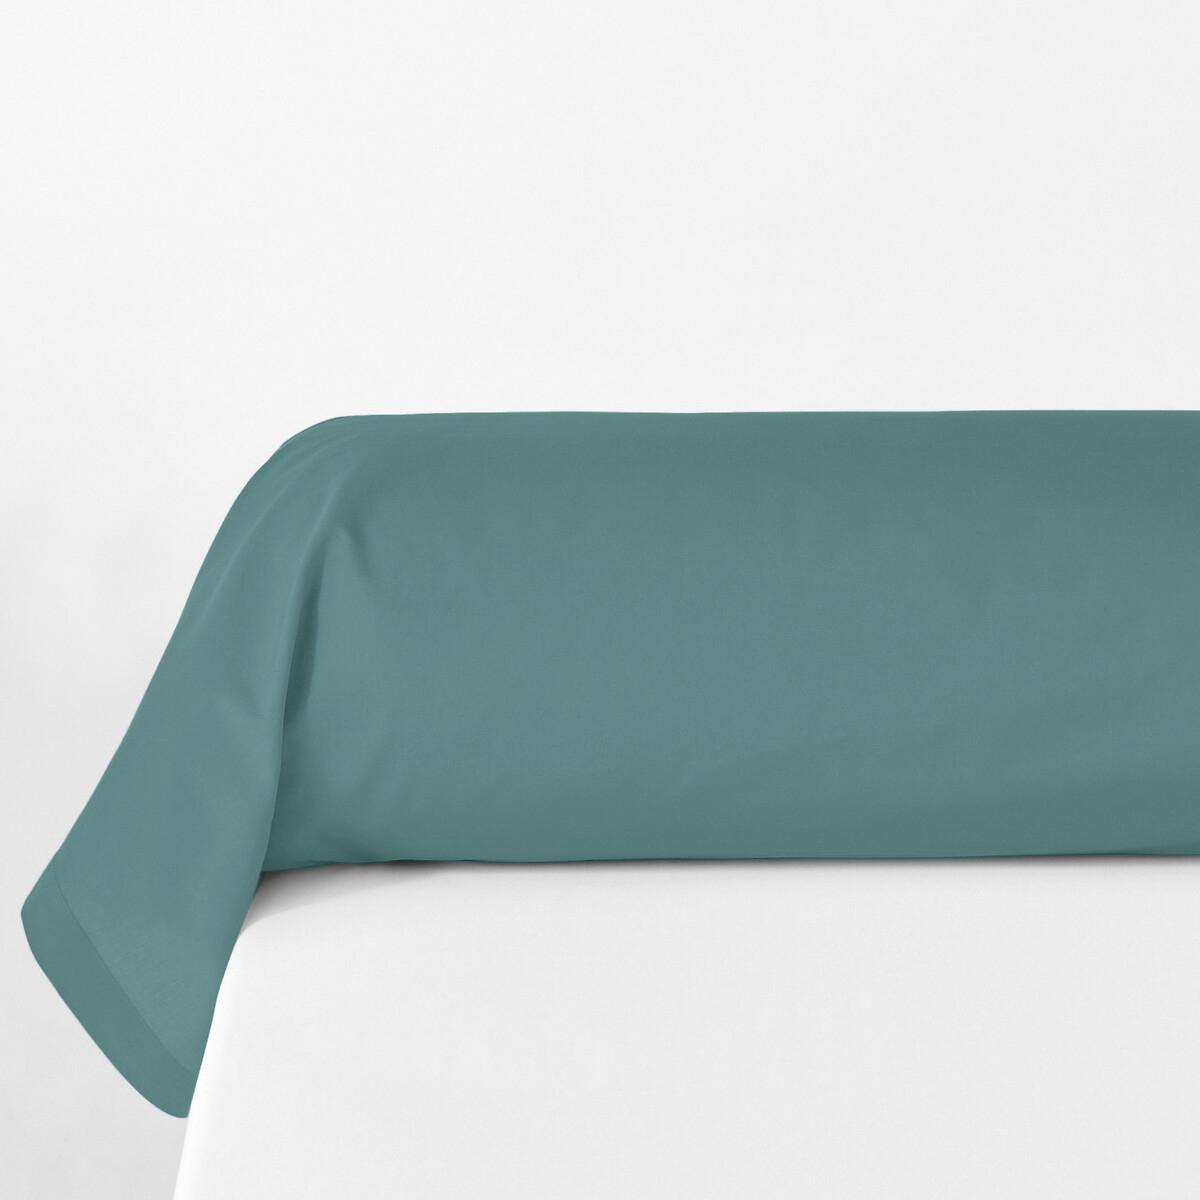 Наволочка La Redoute На подушку-валик из биохлопковой перкали 85 x 185 см синий чехол la redoute на подушку валик ecaille 45 x 45 см синий